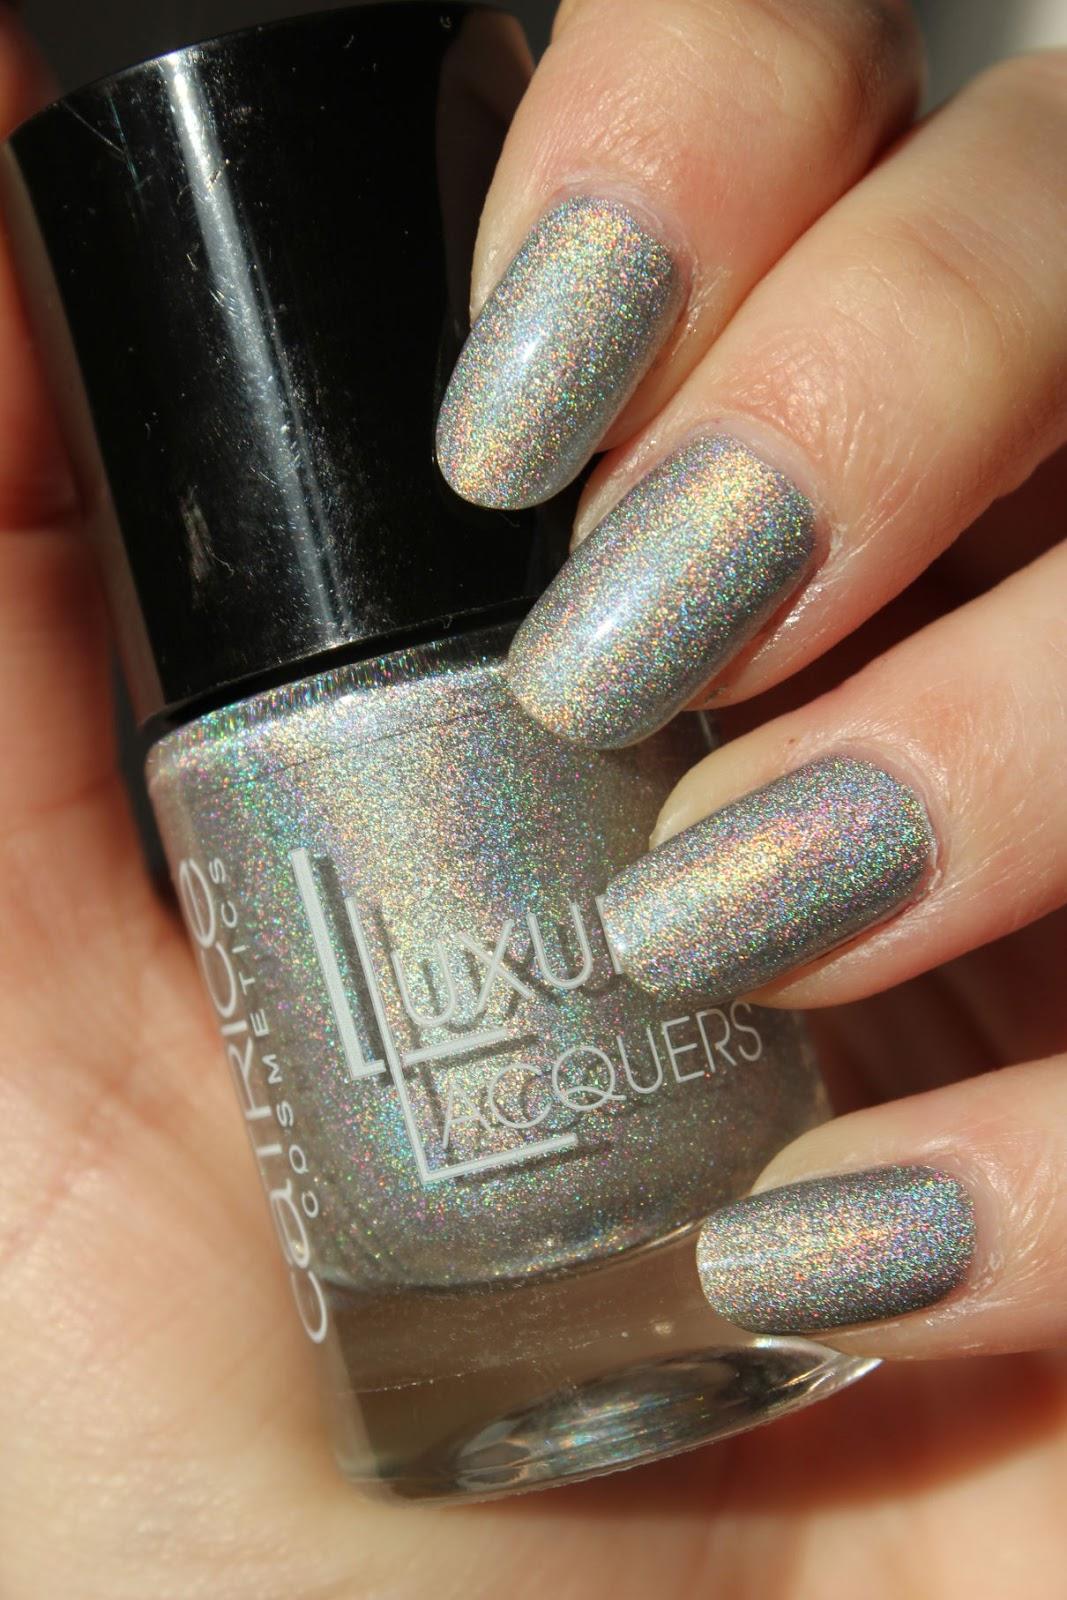 http://lacquediction.blogspot.de/2014/02/catrice-luxury-lacquers-holomania-c01.html